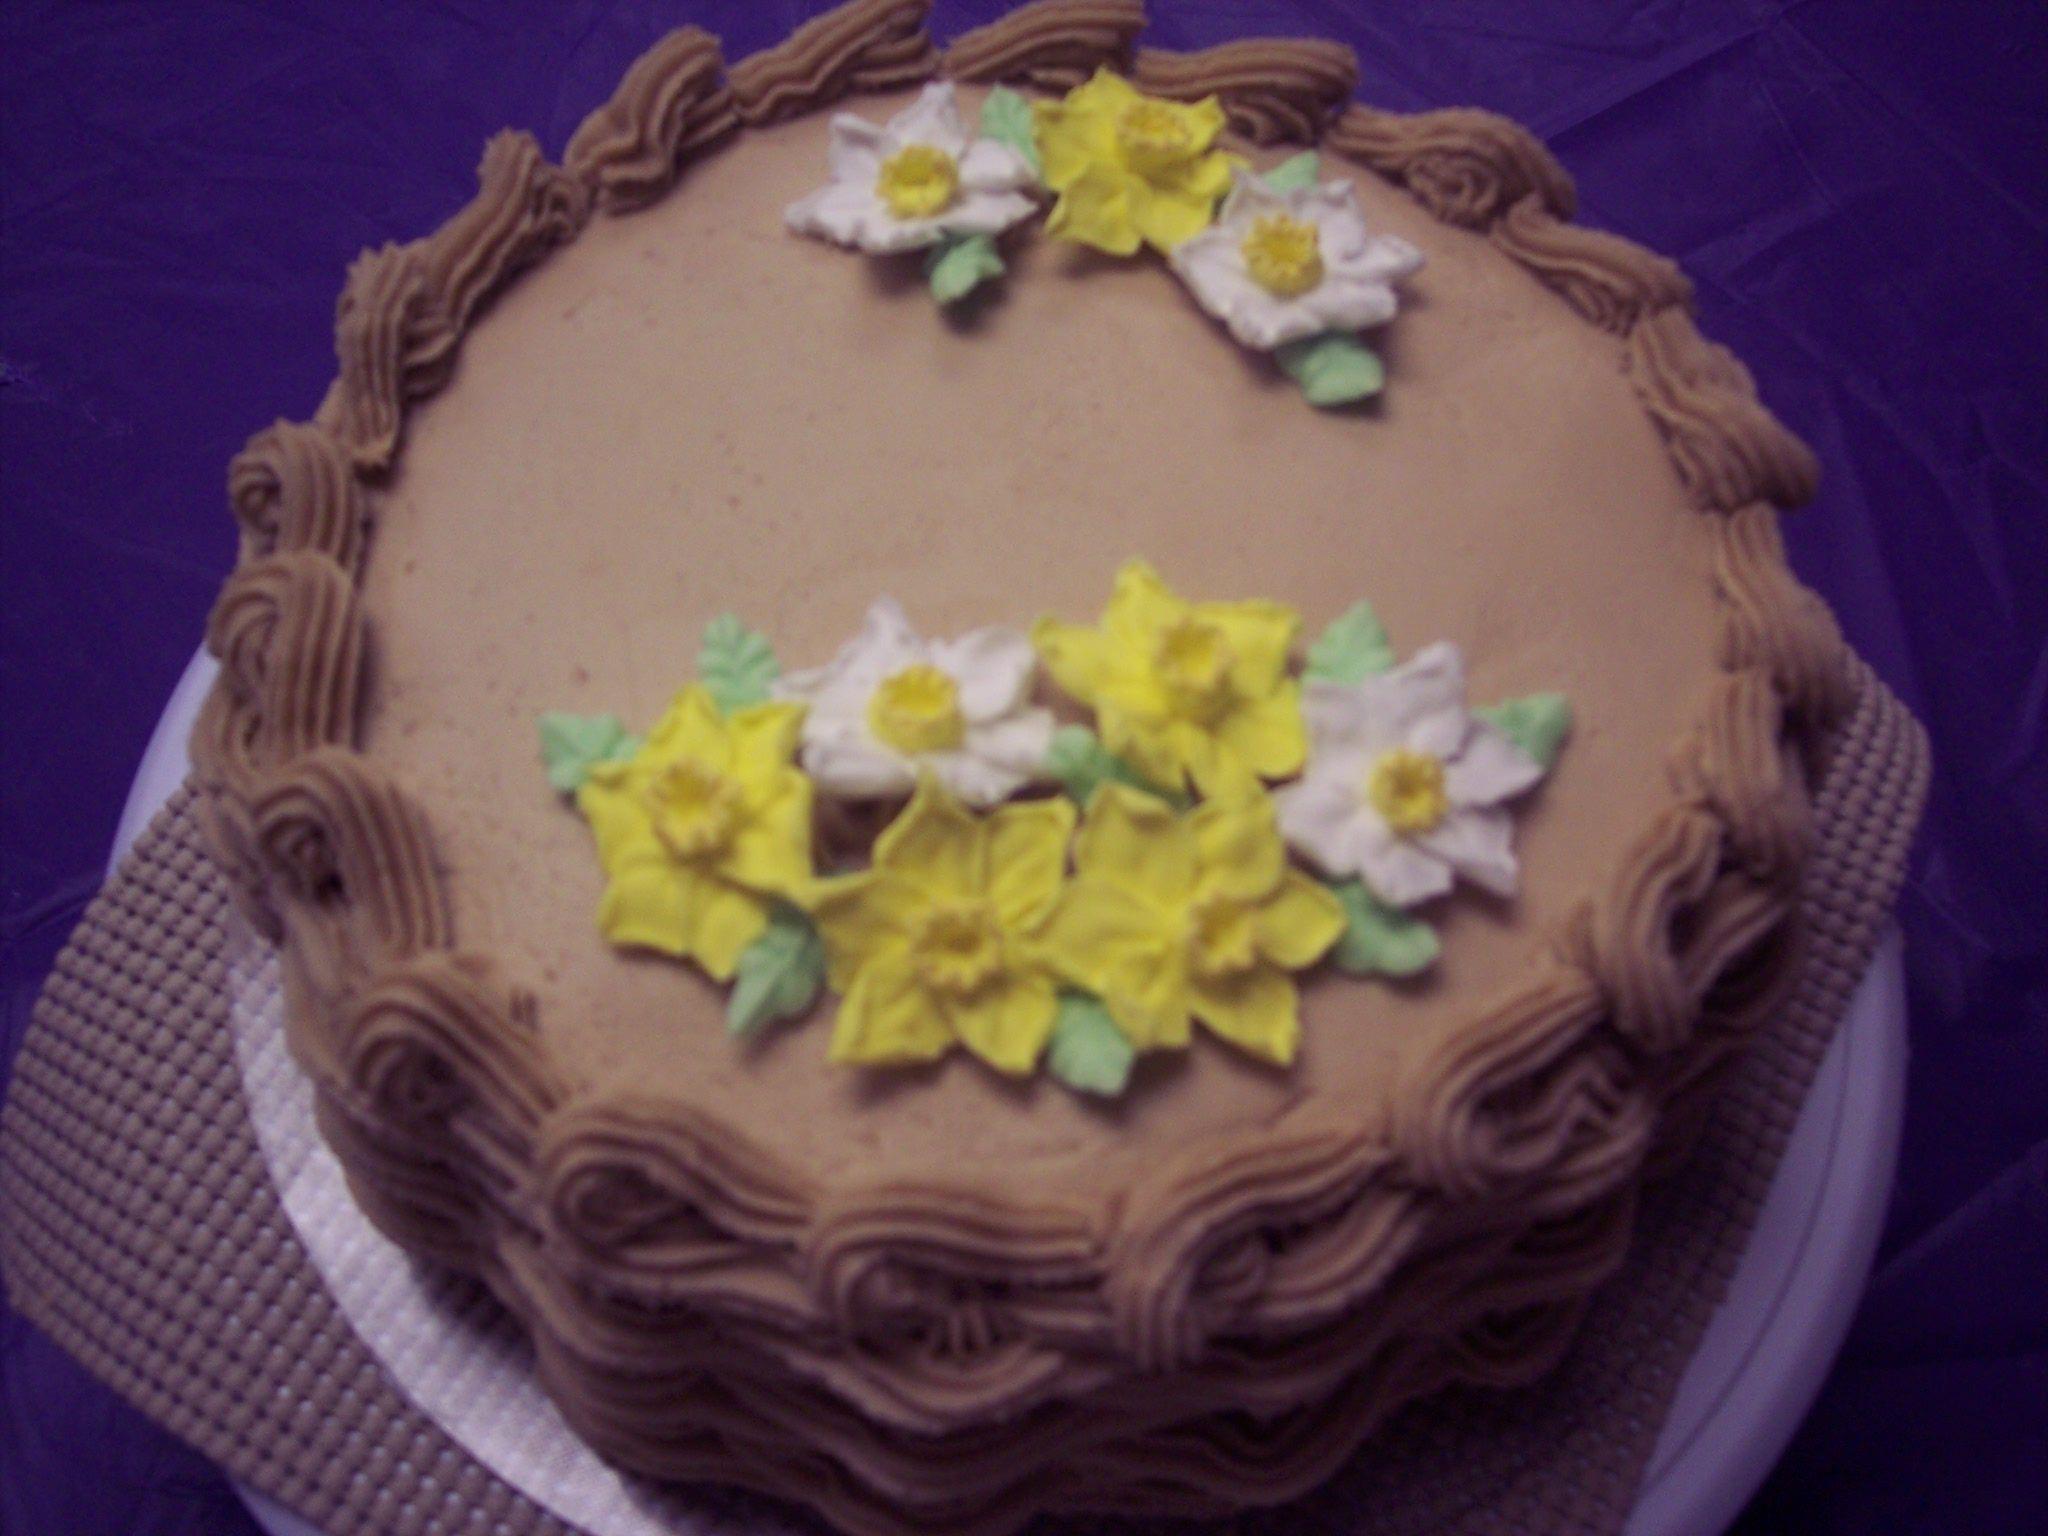 Cake Decoration Ideas Pinterest : Basket Weave Cake decorating ideas Pinterest